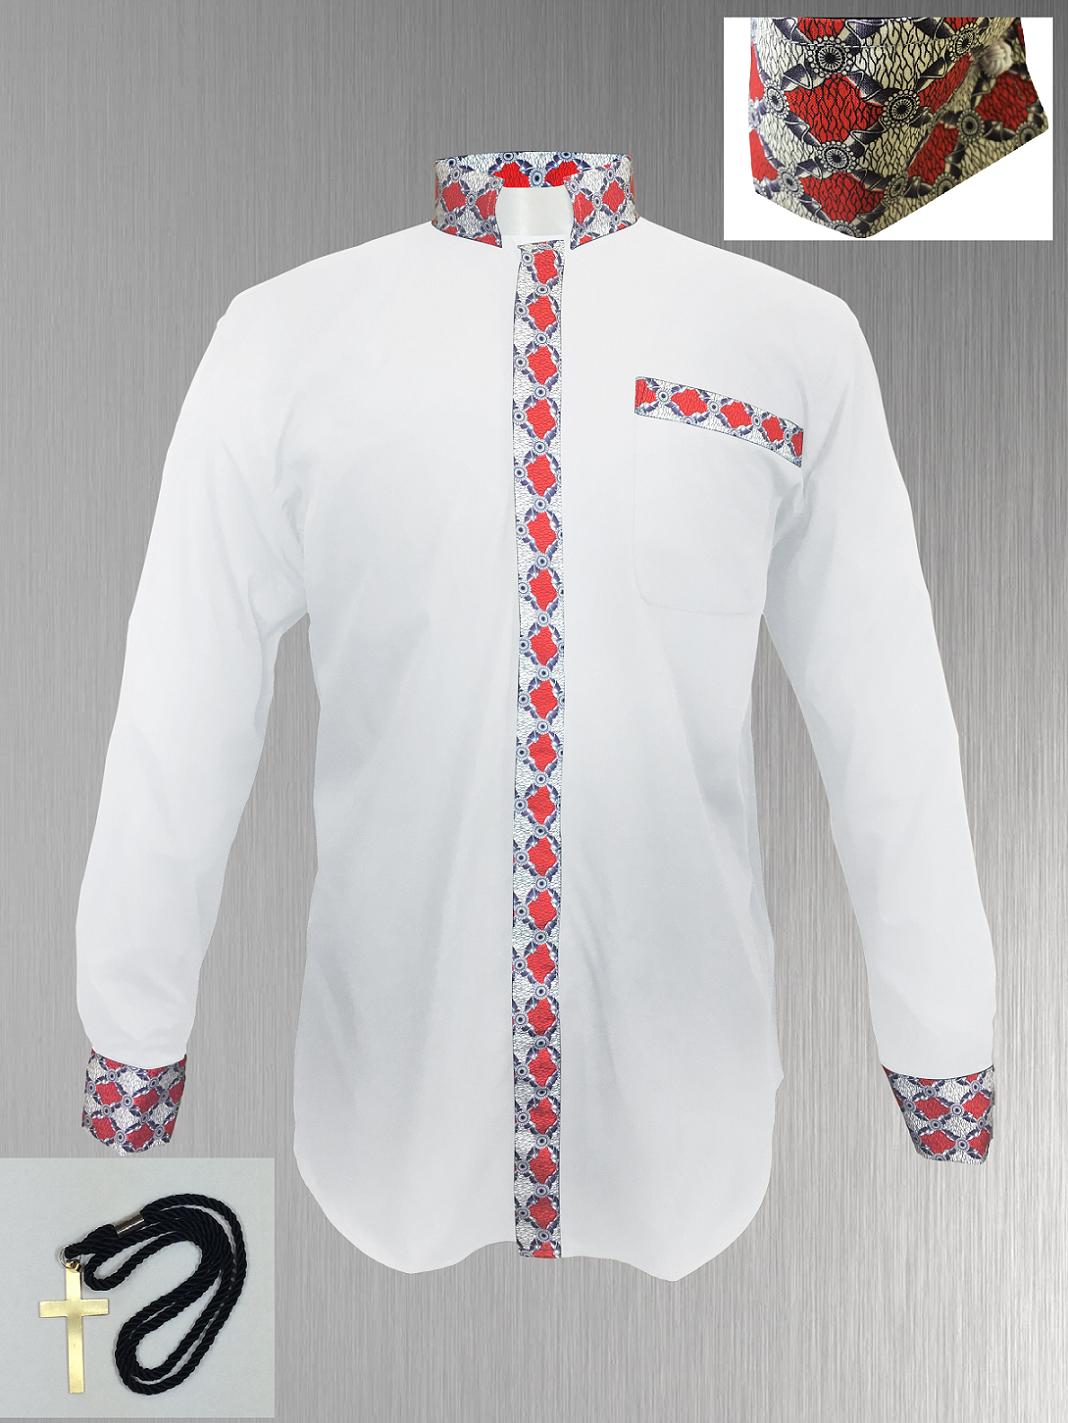 145. Custom Edition Meraki Argyle Men's Tab Collar Clergy Shirt Set - White